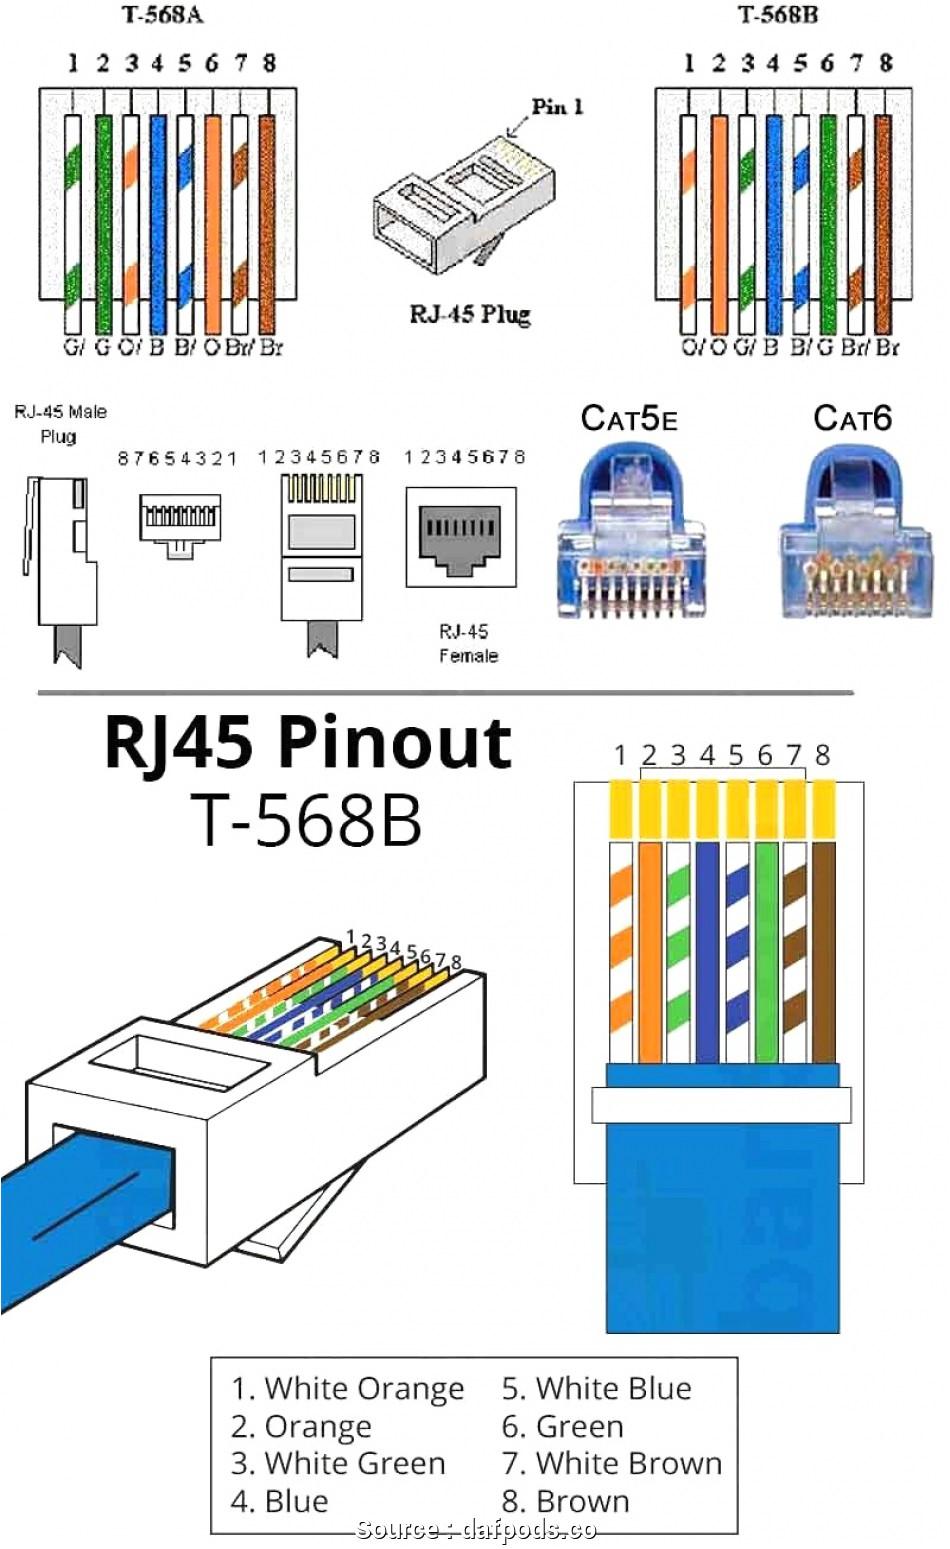 standard cat 6 wiring diagram wiring diagram insidecat 6 wire diagram wiring diagram forward standard cat